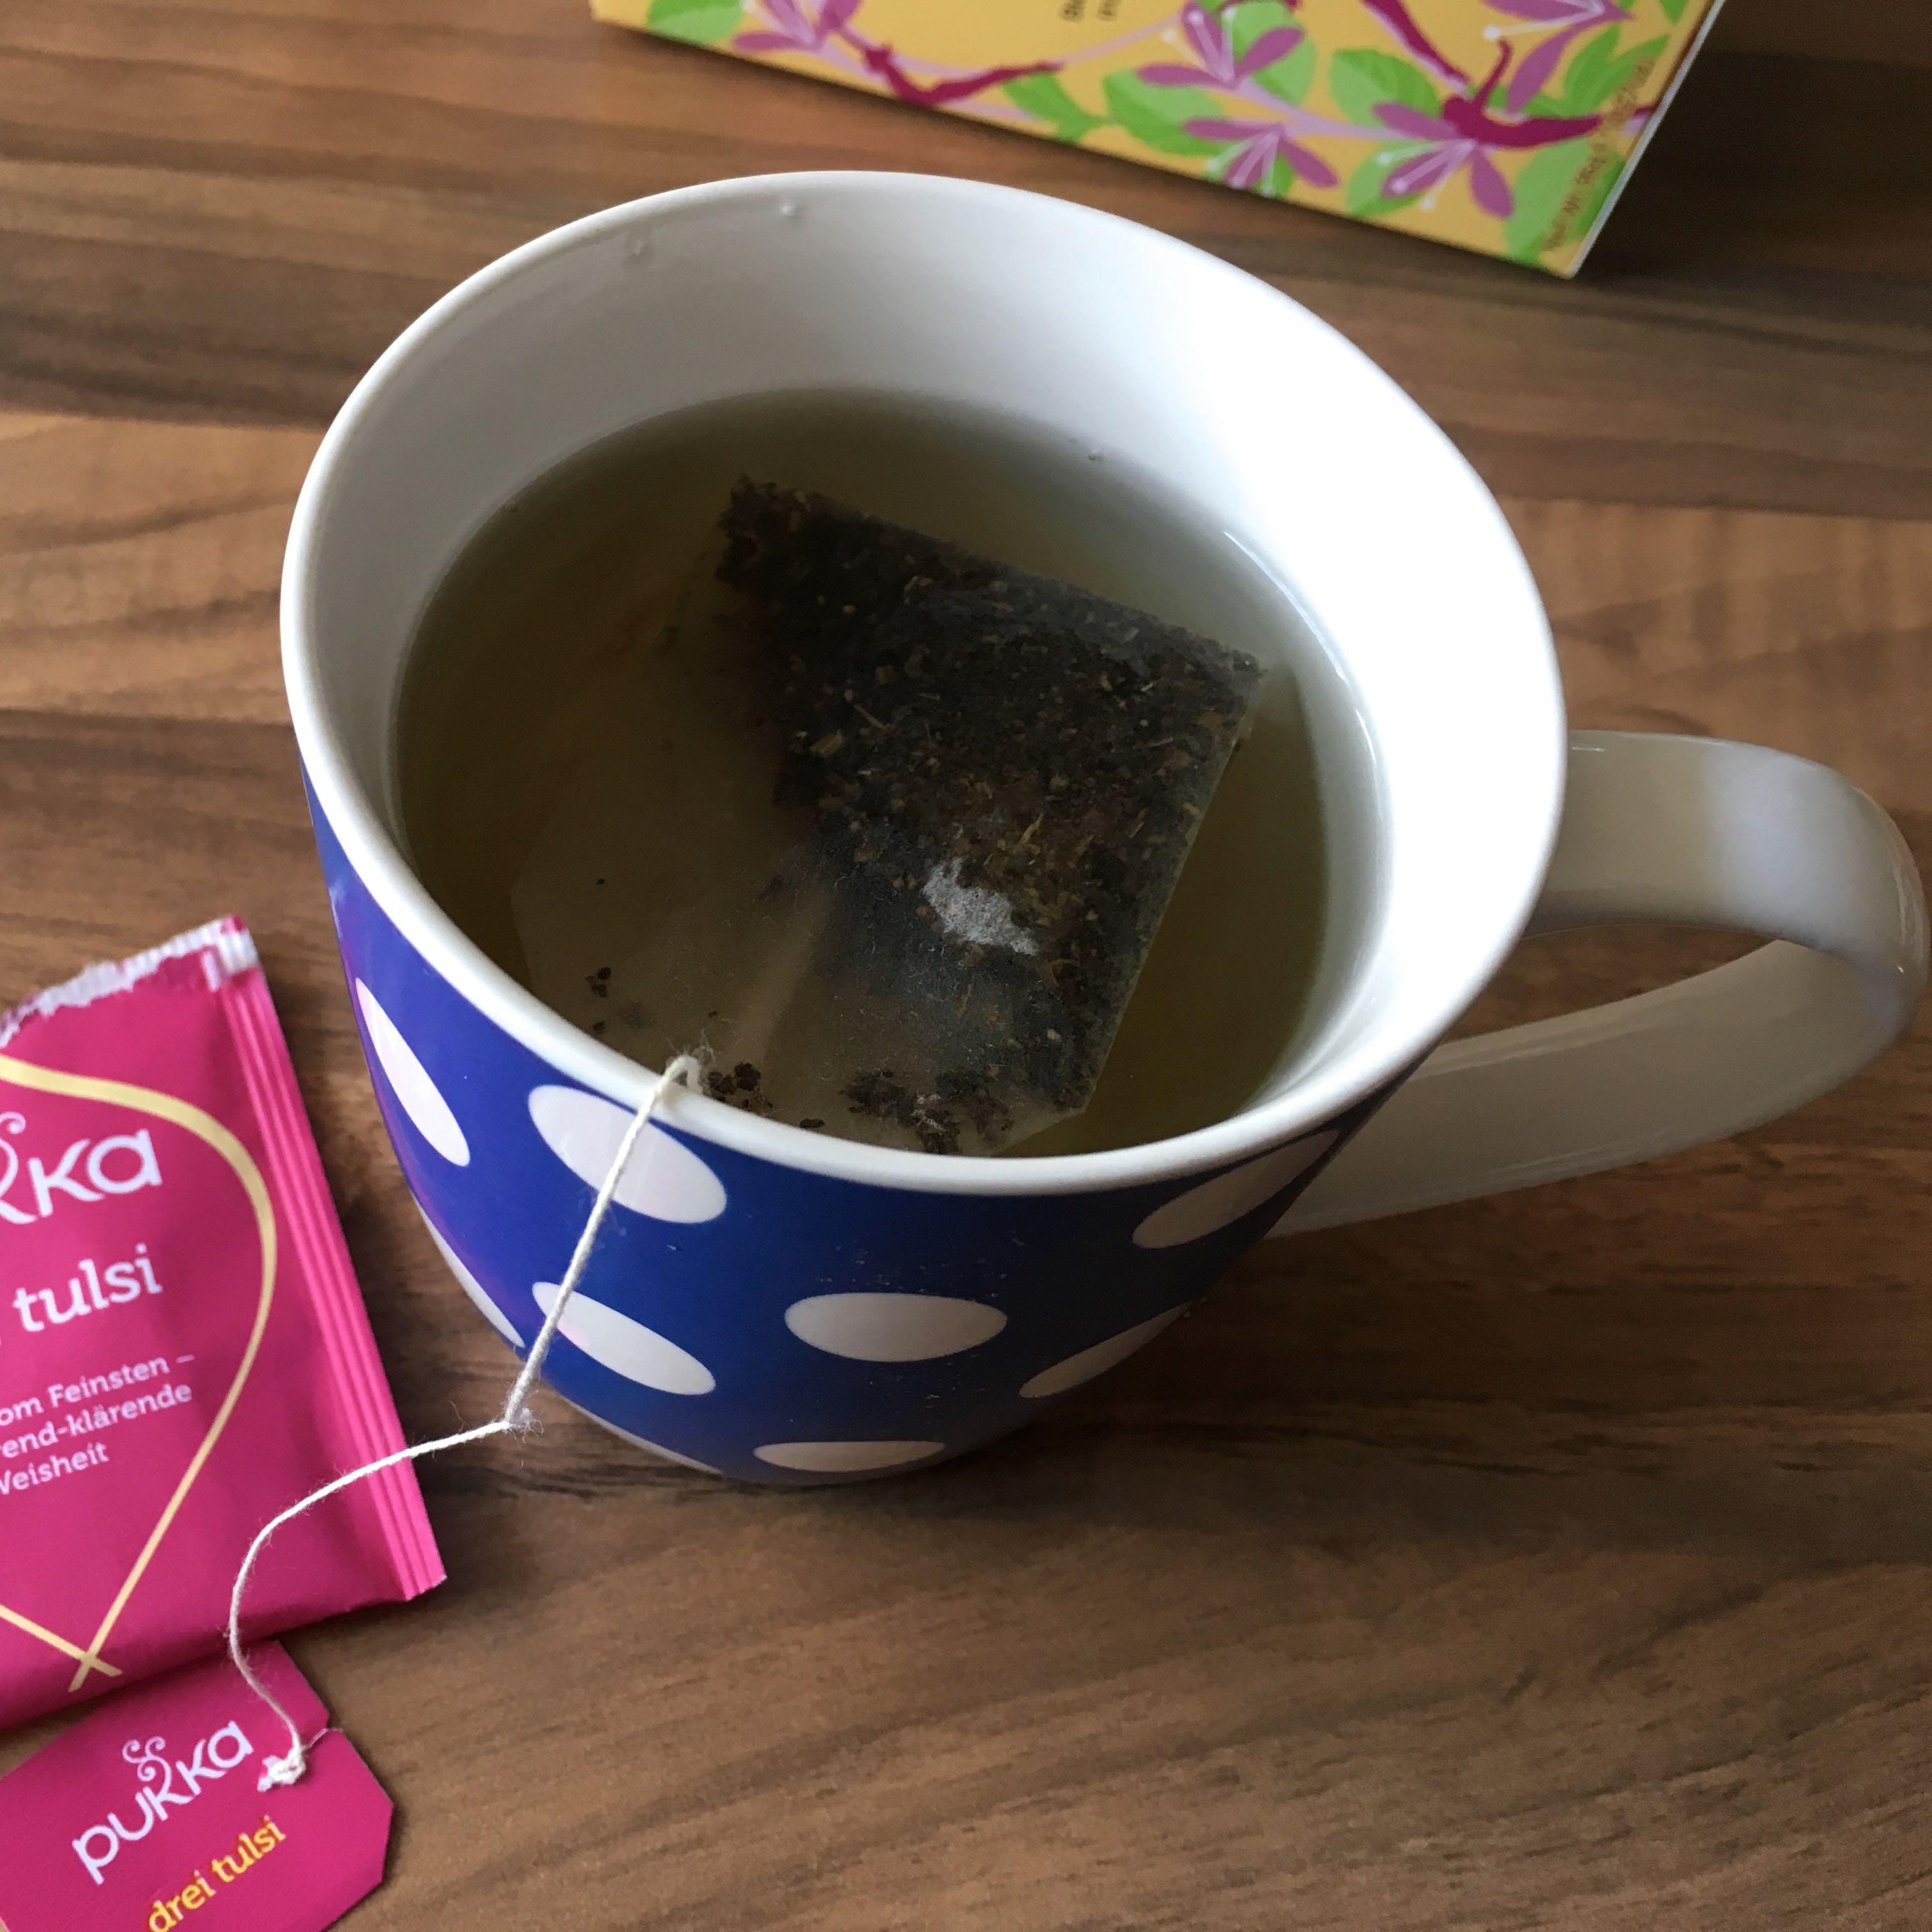 Ayurveda-Tipps gegen dicke Bäuche: Tulsa-Tee